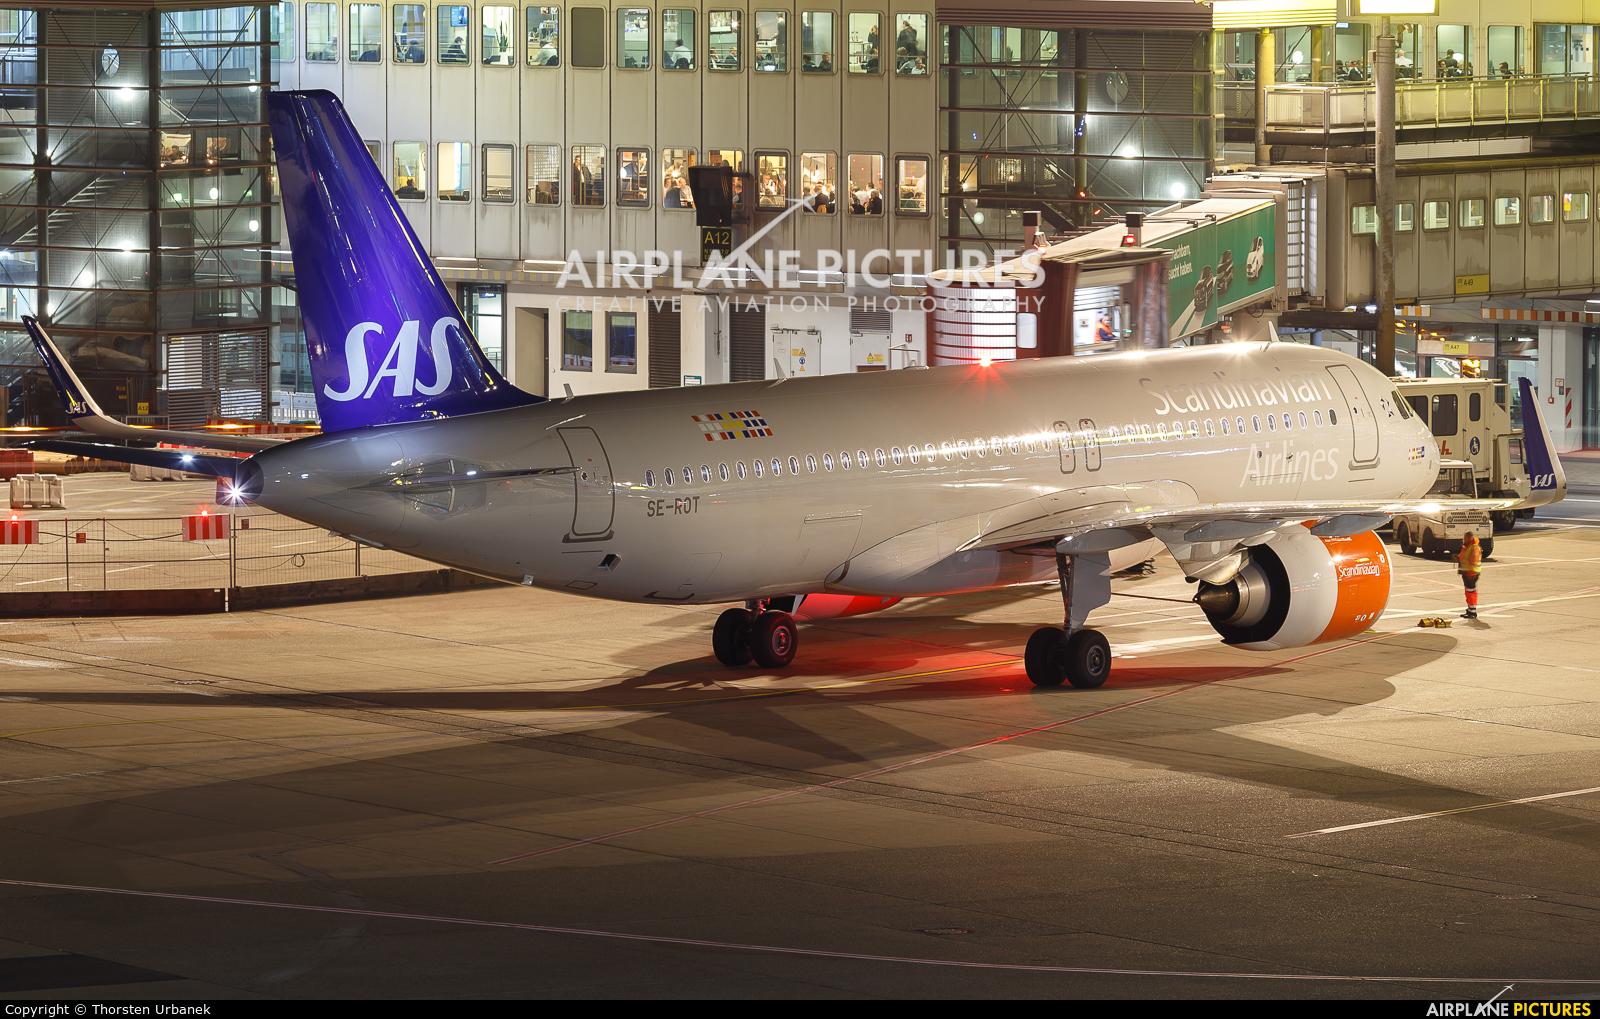 SAS - Scandinavian Airlines SE-ROT aircraft at Düsseldorf